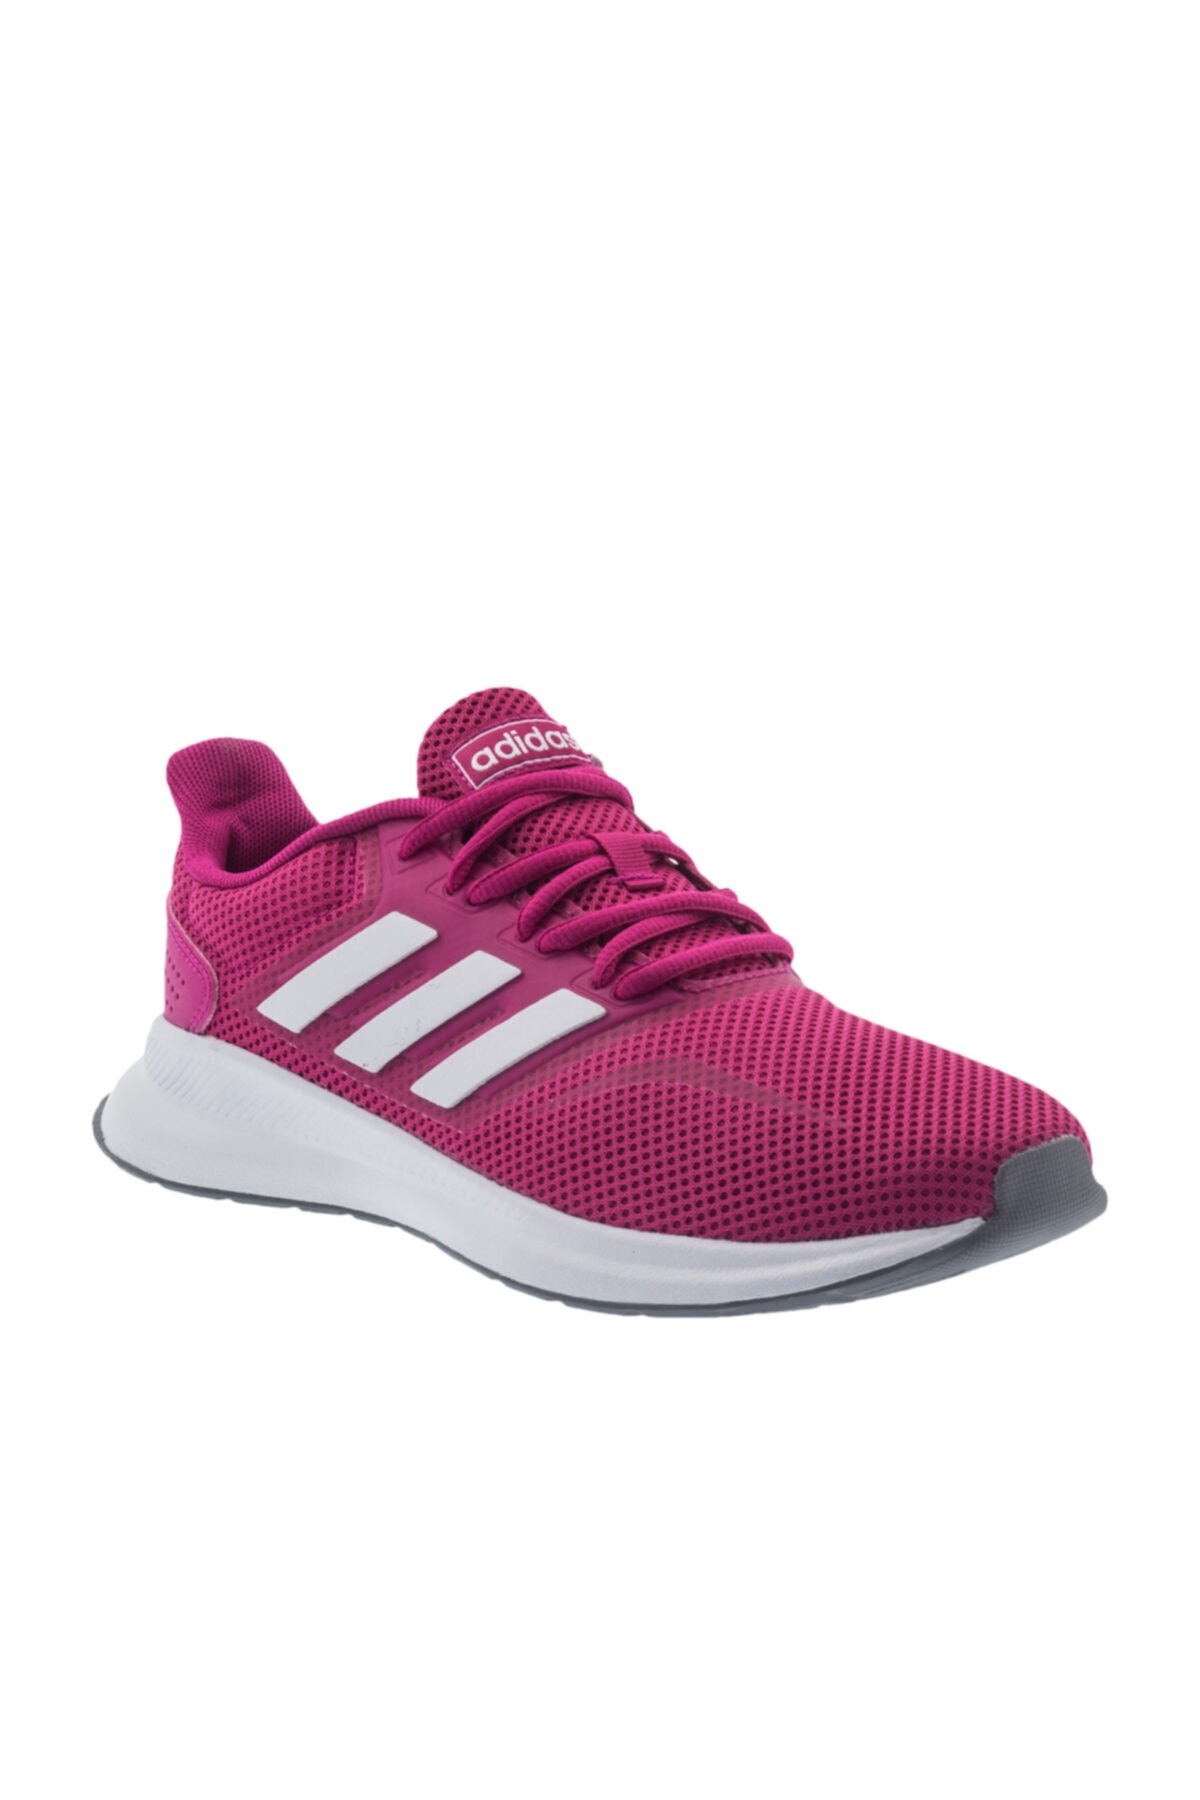 adidas Runfalcon Pembe Spor Ayakkabı (f36219) 1